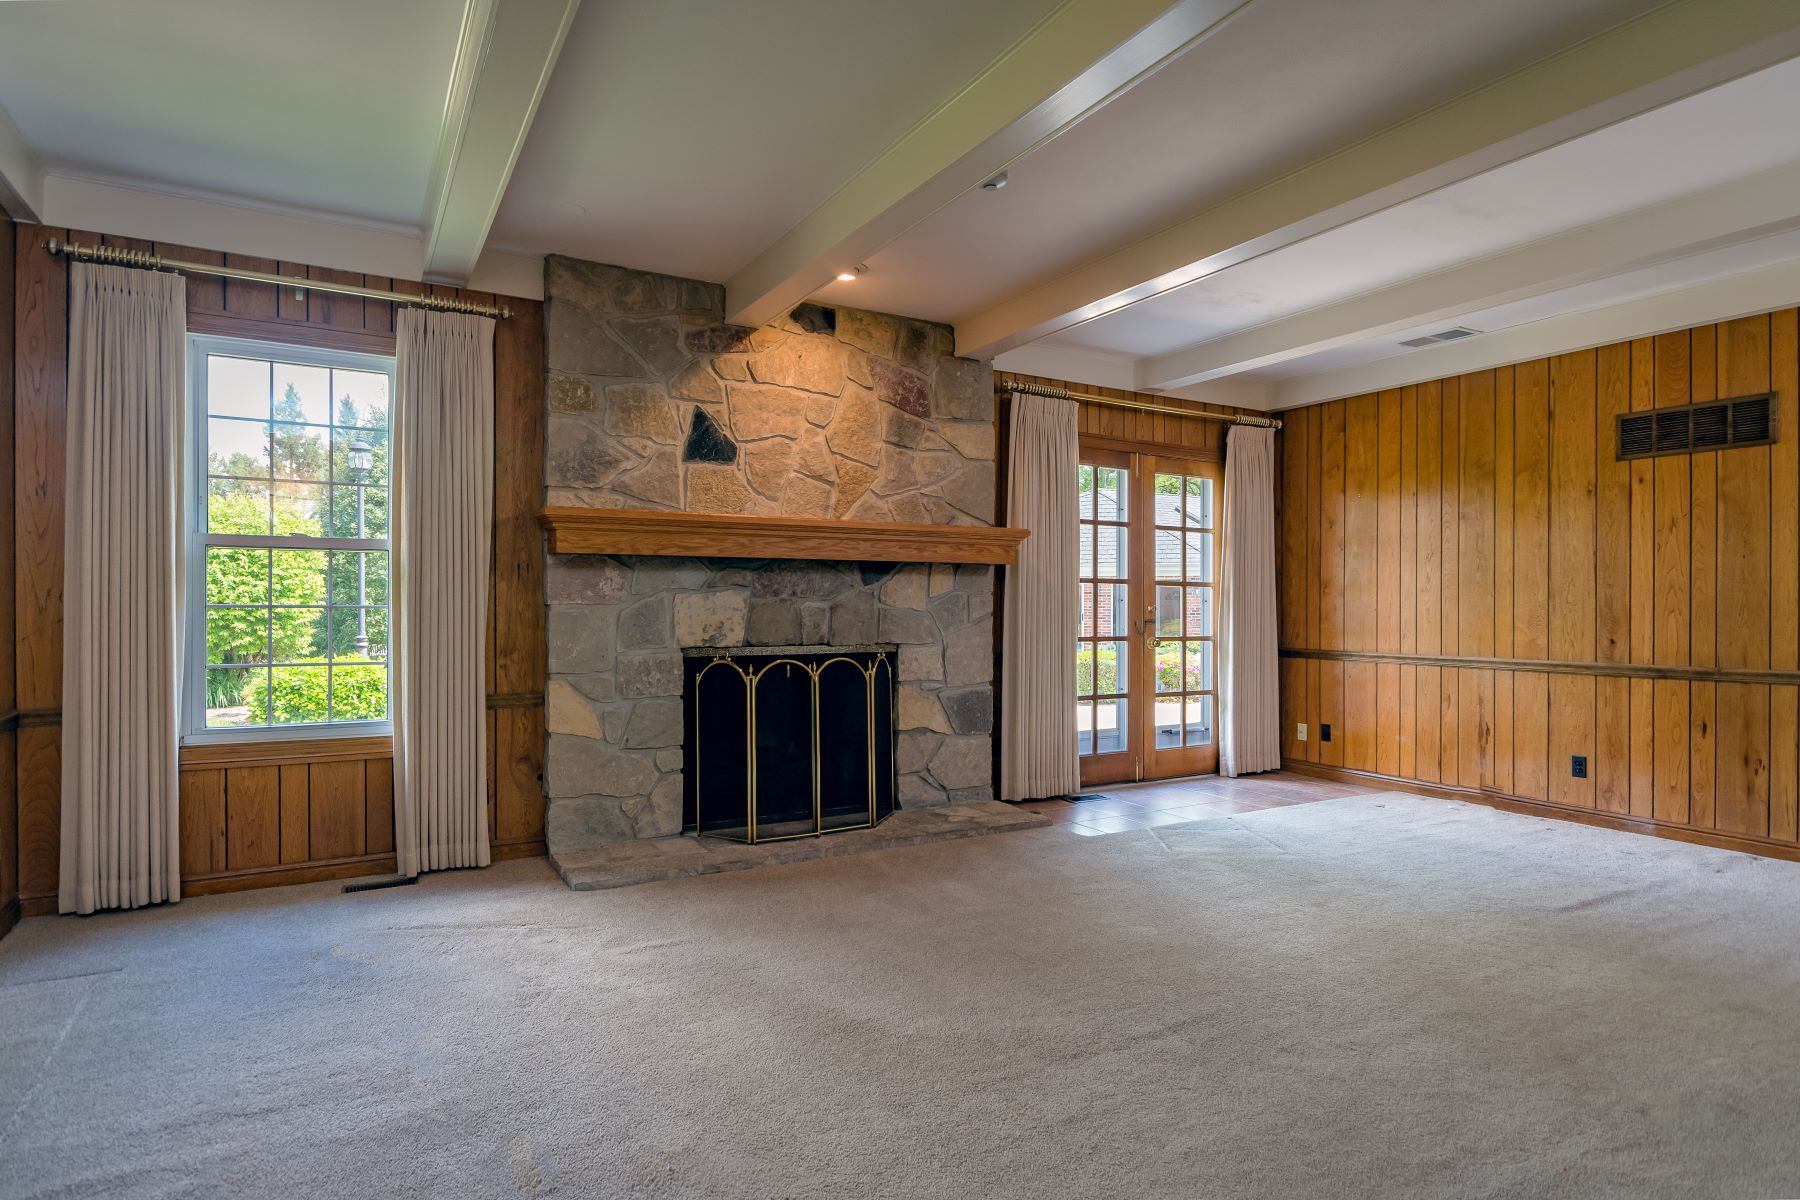 Additional photo for property listing at 12 Stoney Brook Lane Ladue, Missouri 63124 United States